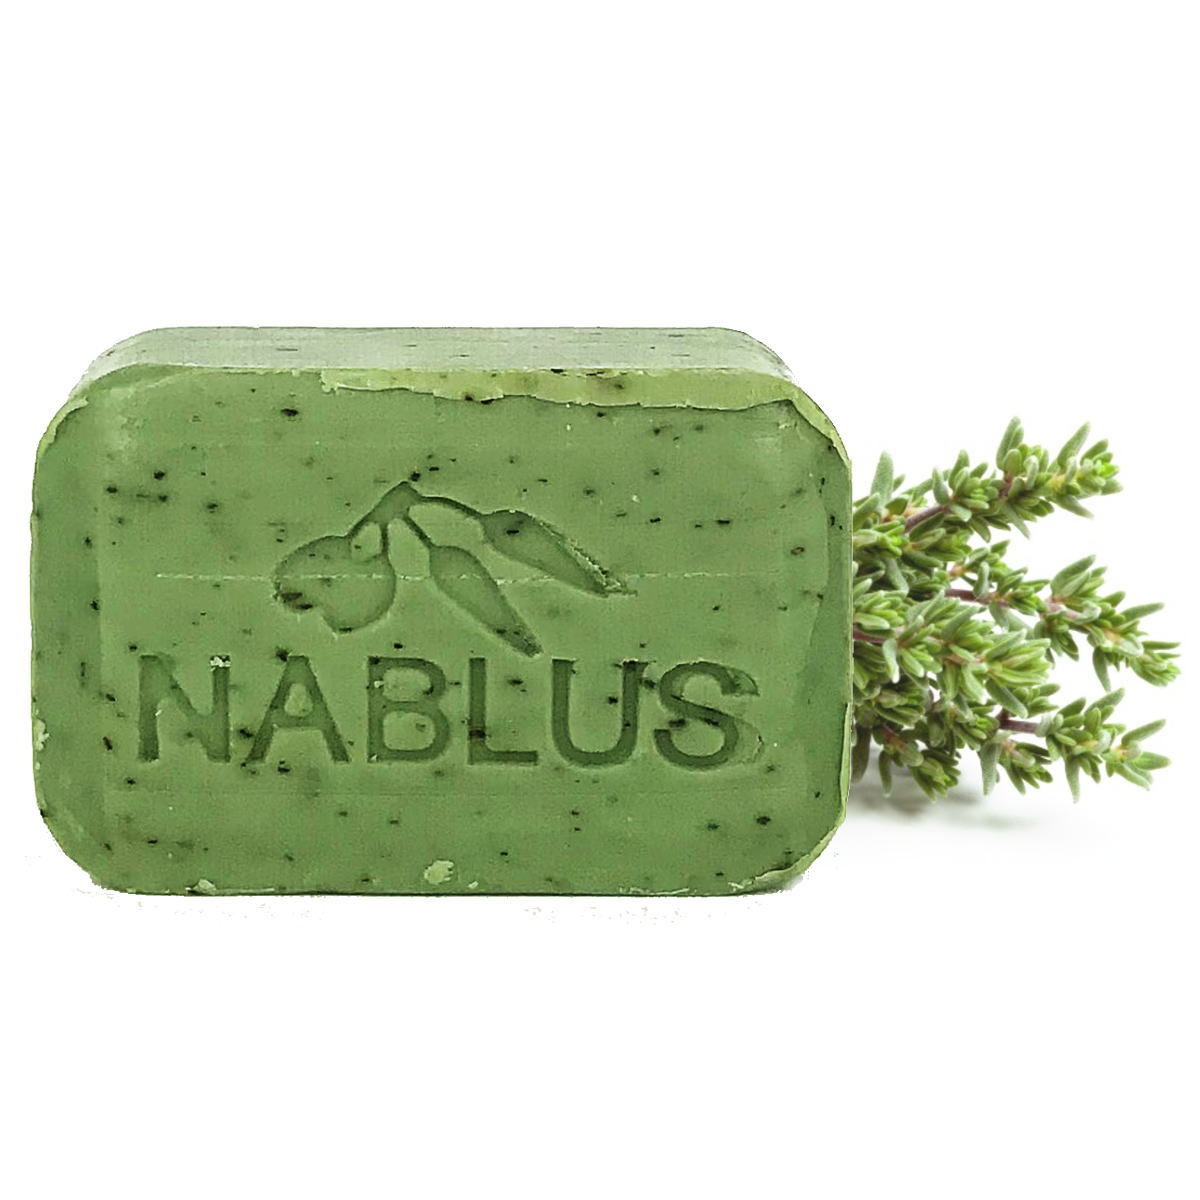 Nablus Soap ナーブルスソープ - タイム - 無添加 オーガニック石鹸